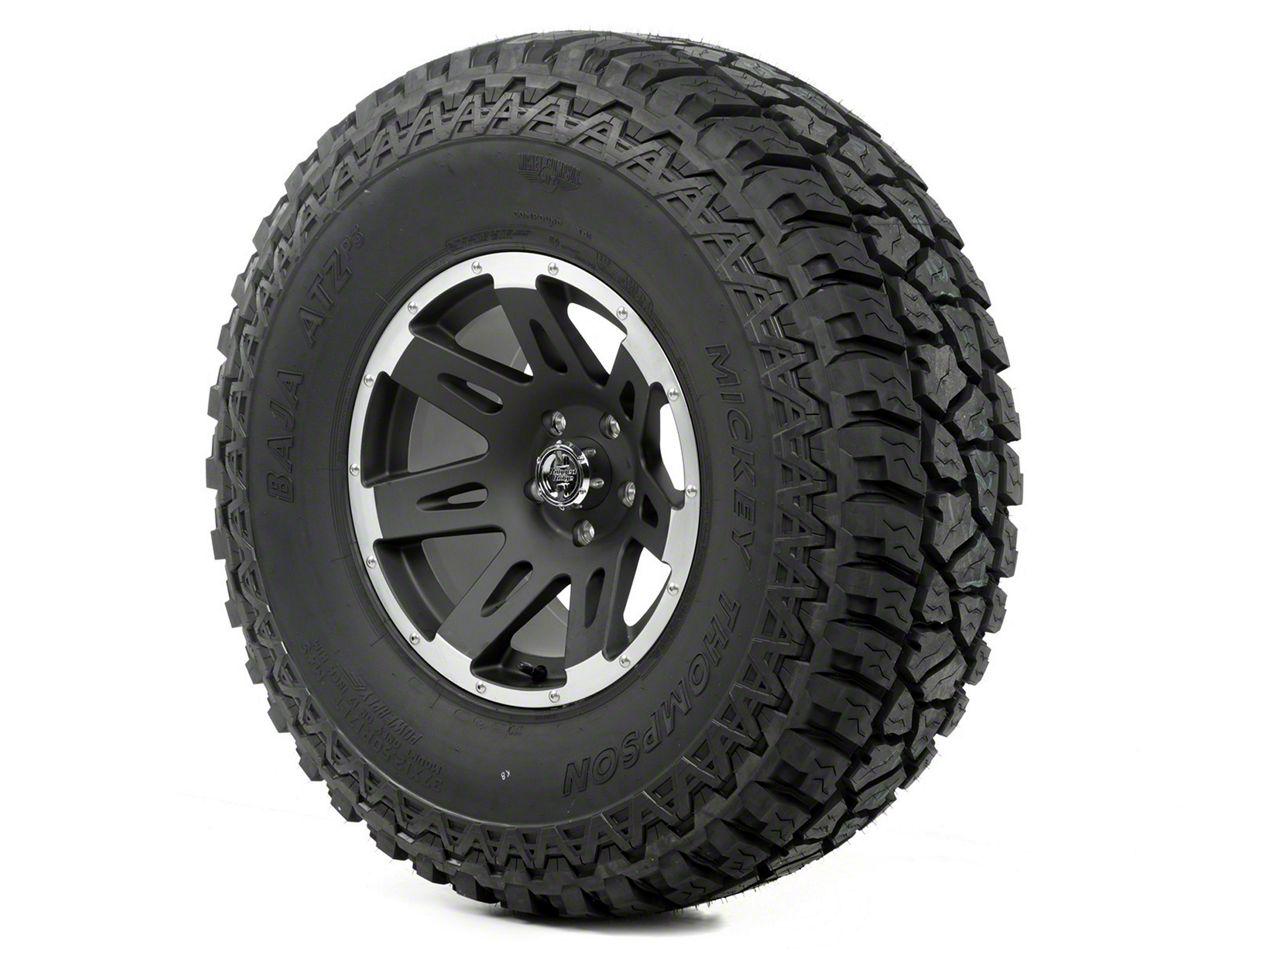 Rugged Ridge XHD Wheel 17x9 Black Satin w/ Machined Lip and Mickey Thompson ATZ P3 37x12.50x17 Tire (07-18 Jeep Wrangler JK)